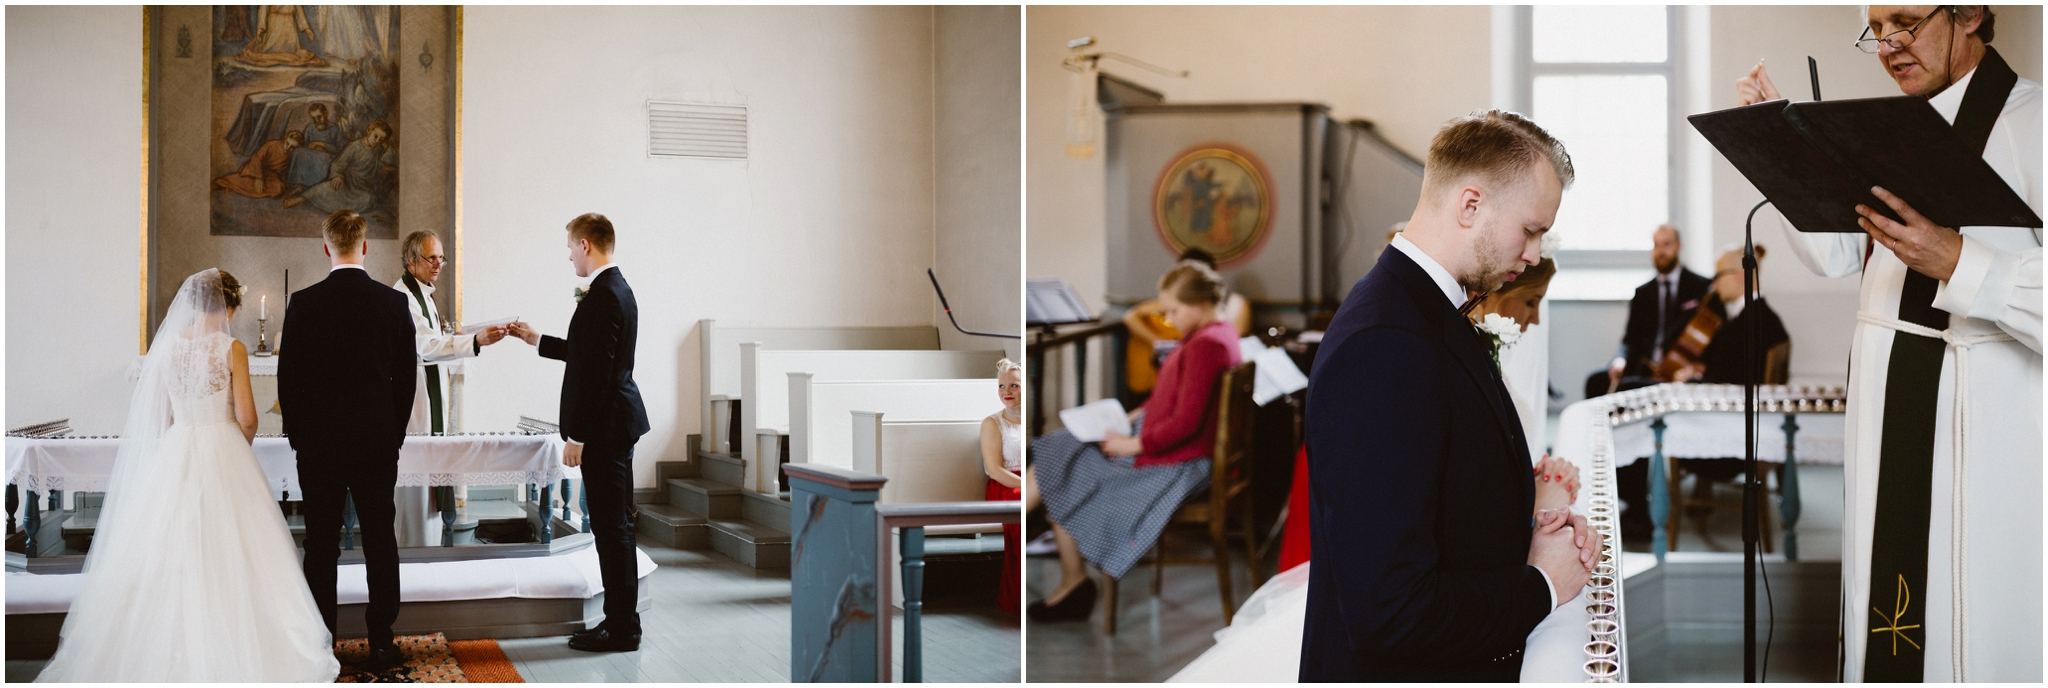 Leevi + Susanna -- Patrick Karkkolainen Wedding Photographer + Adventurer-67.jpg